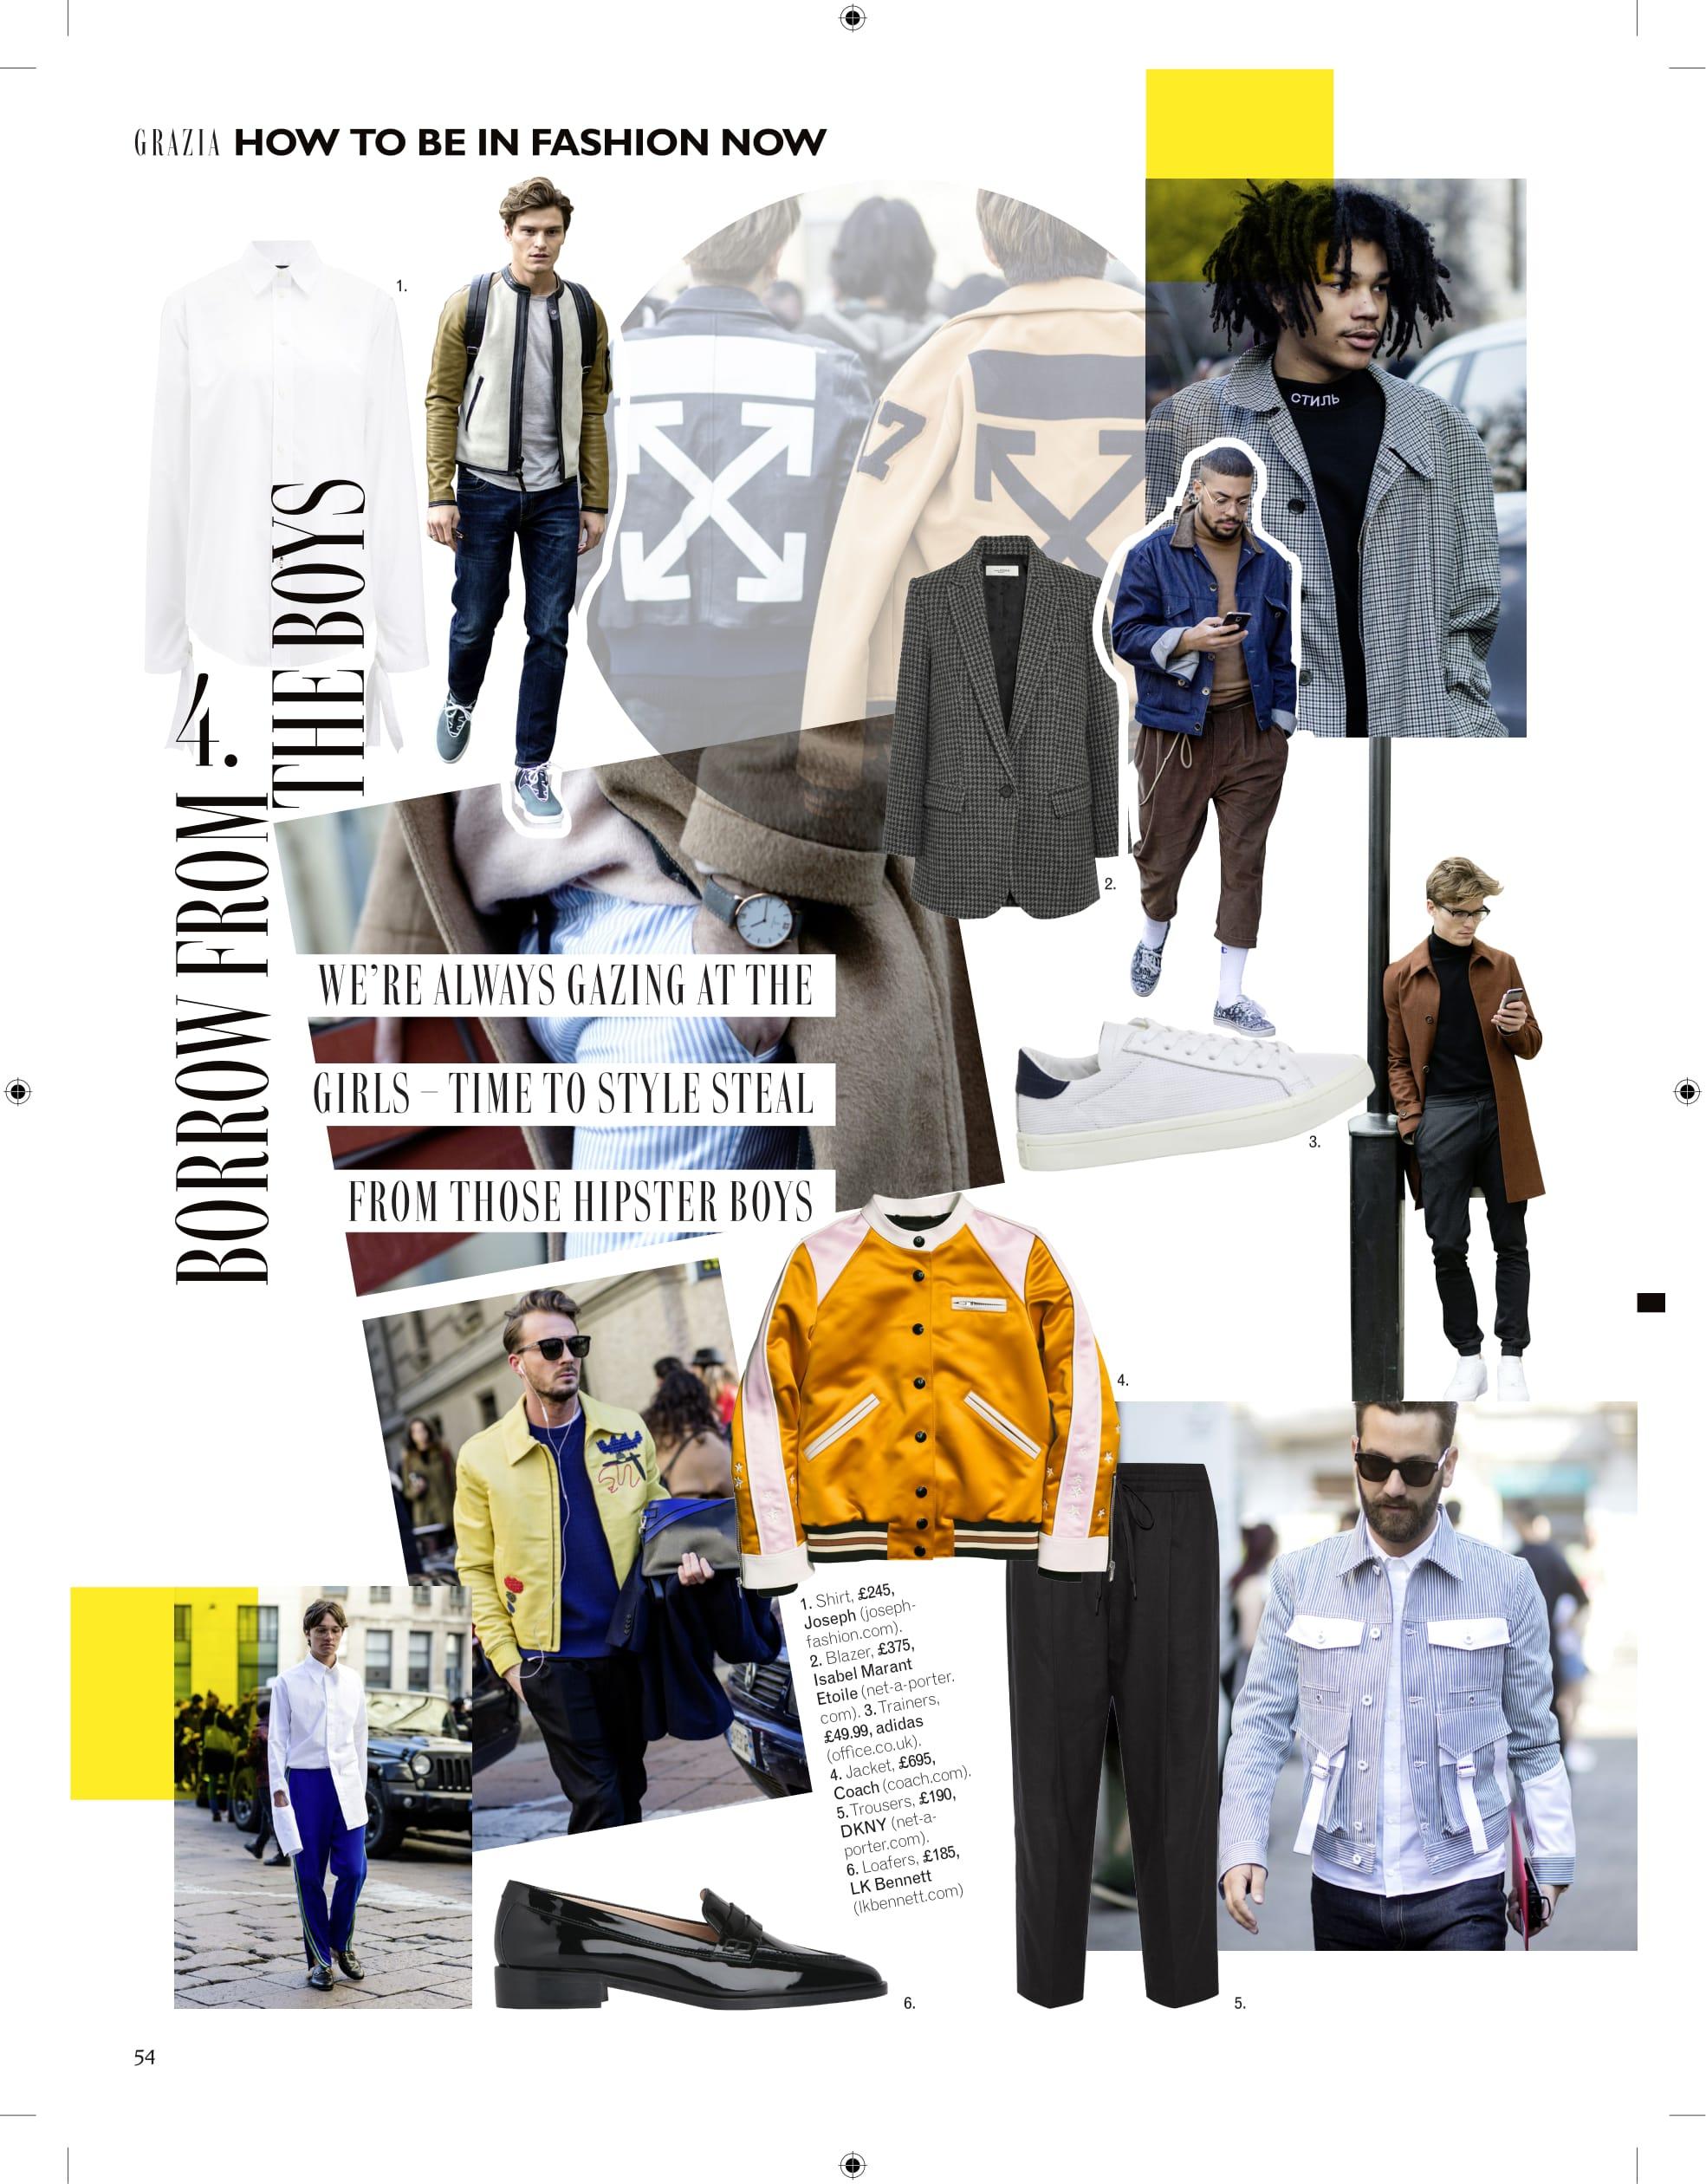 Fashion_STREET STYLE SPESH 6pp_pdf_3-1.jpg